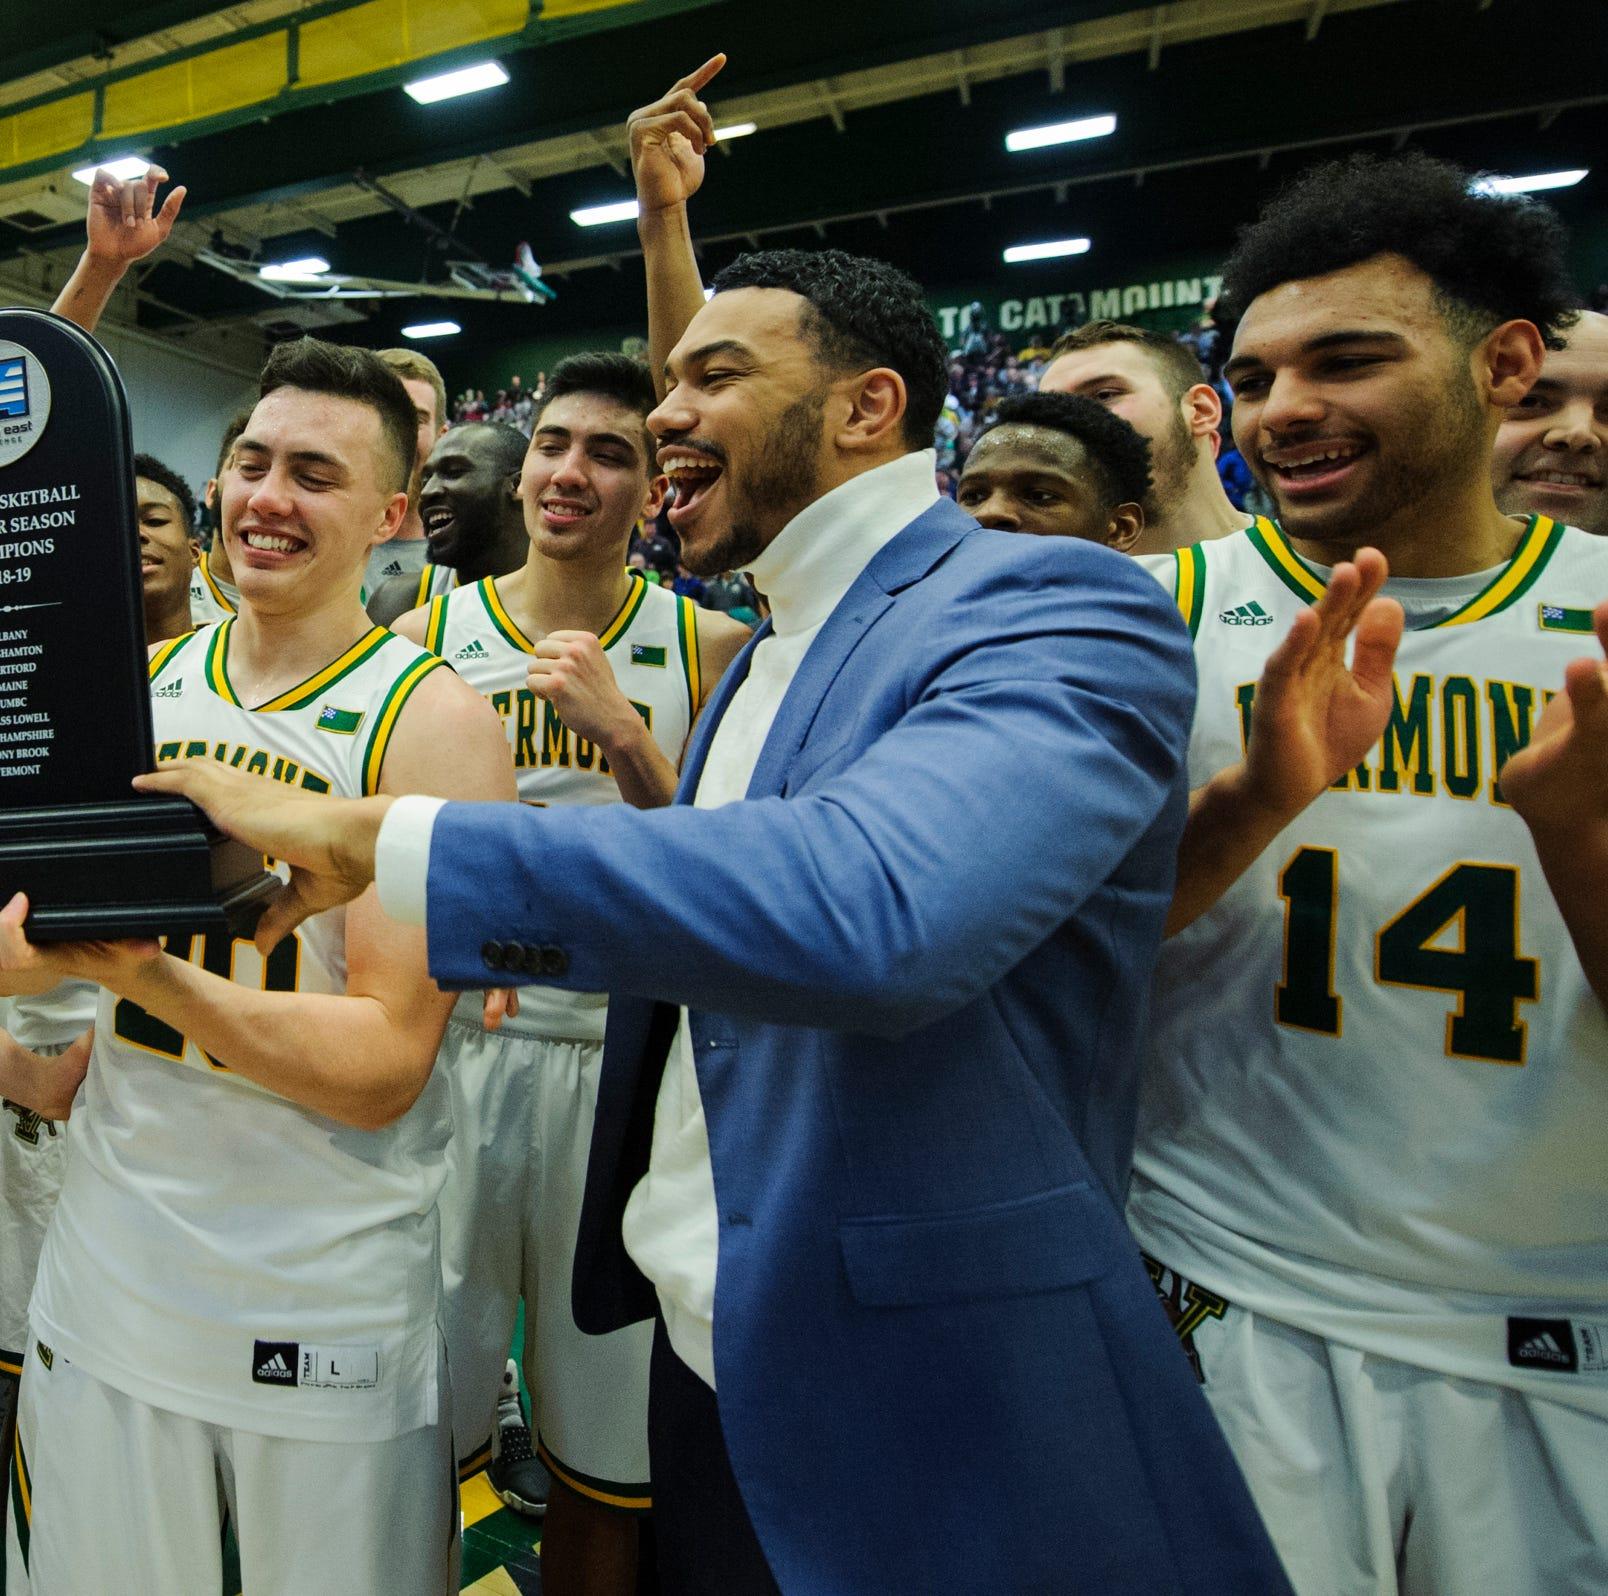 UVM men's basketball: Catamounts hang on to claim America East crown